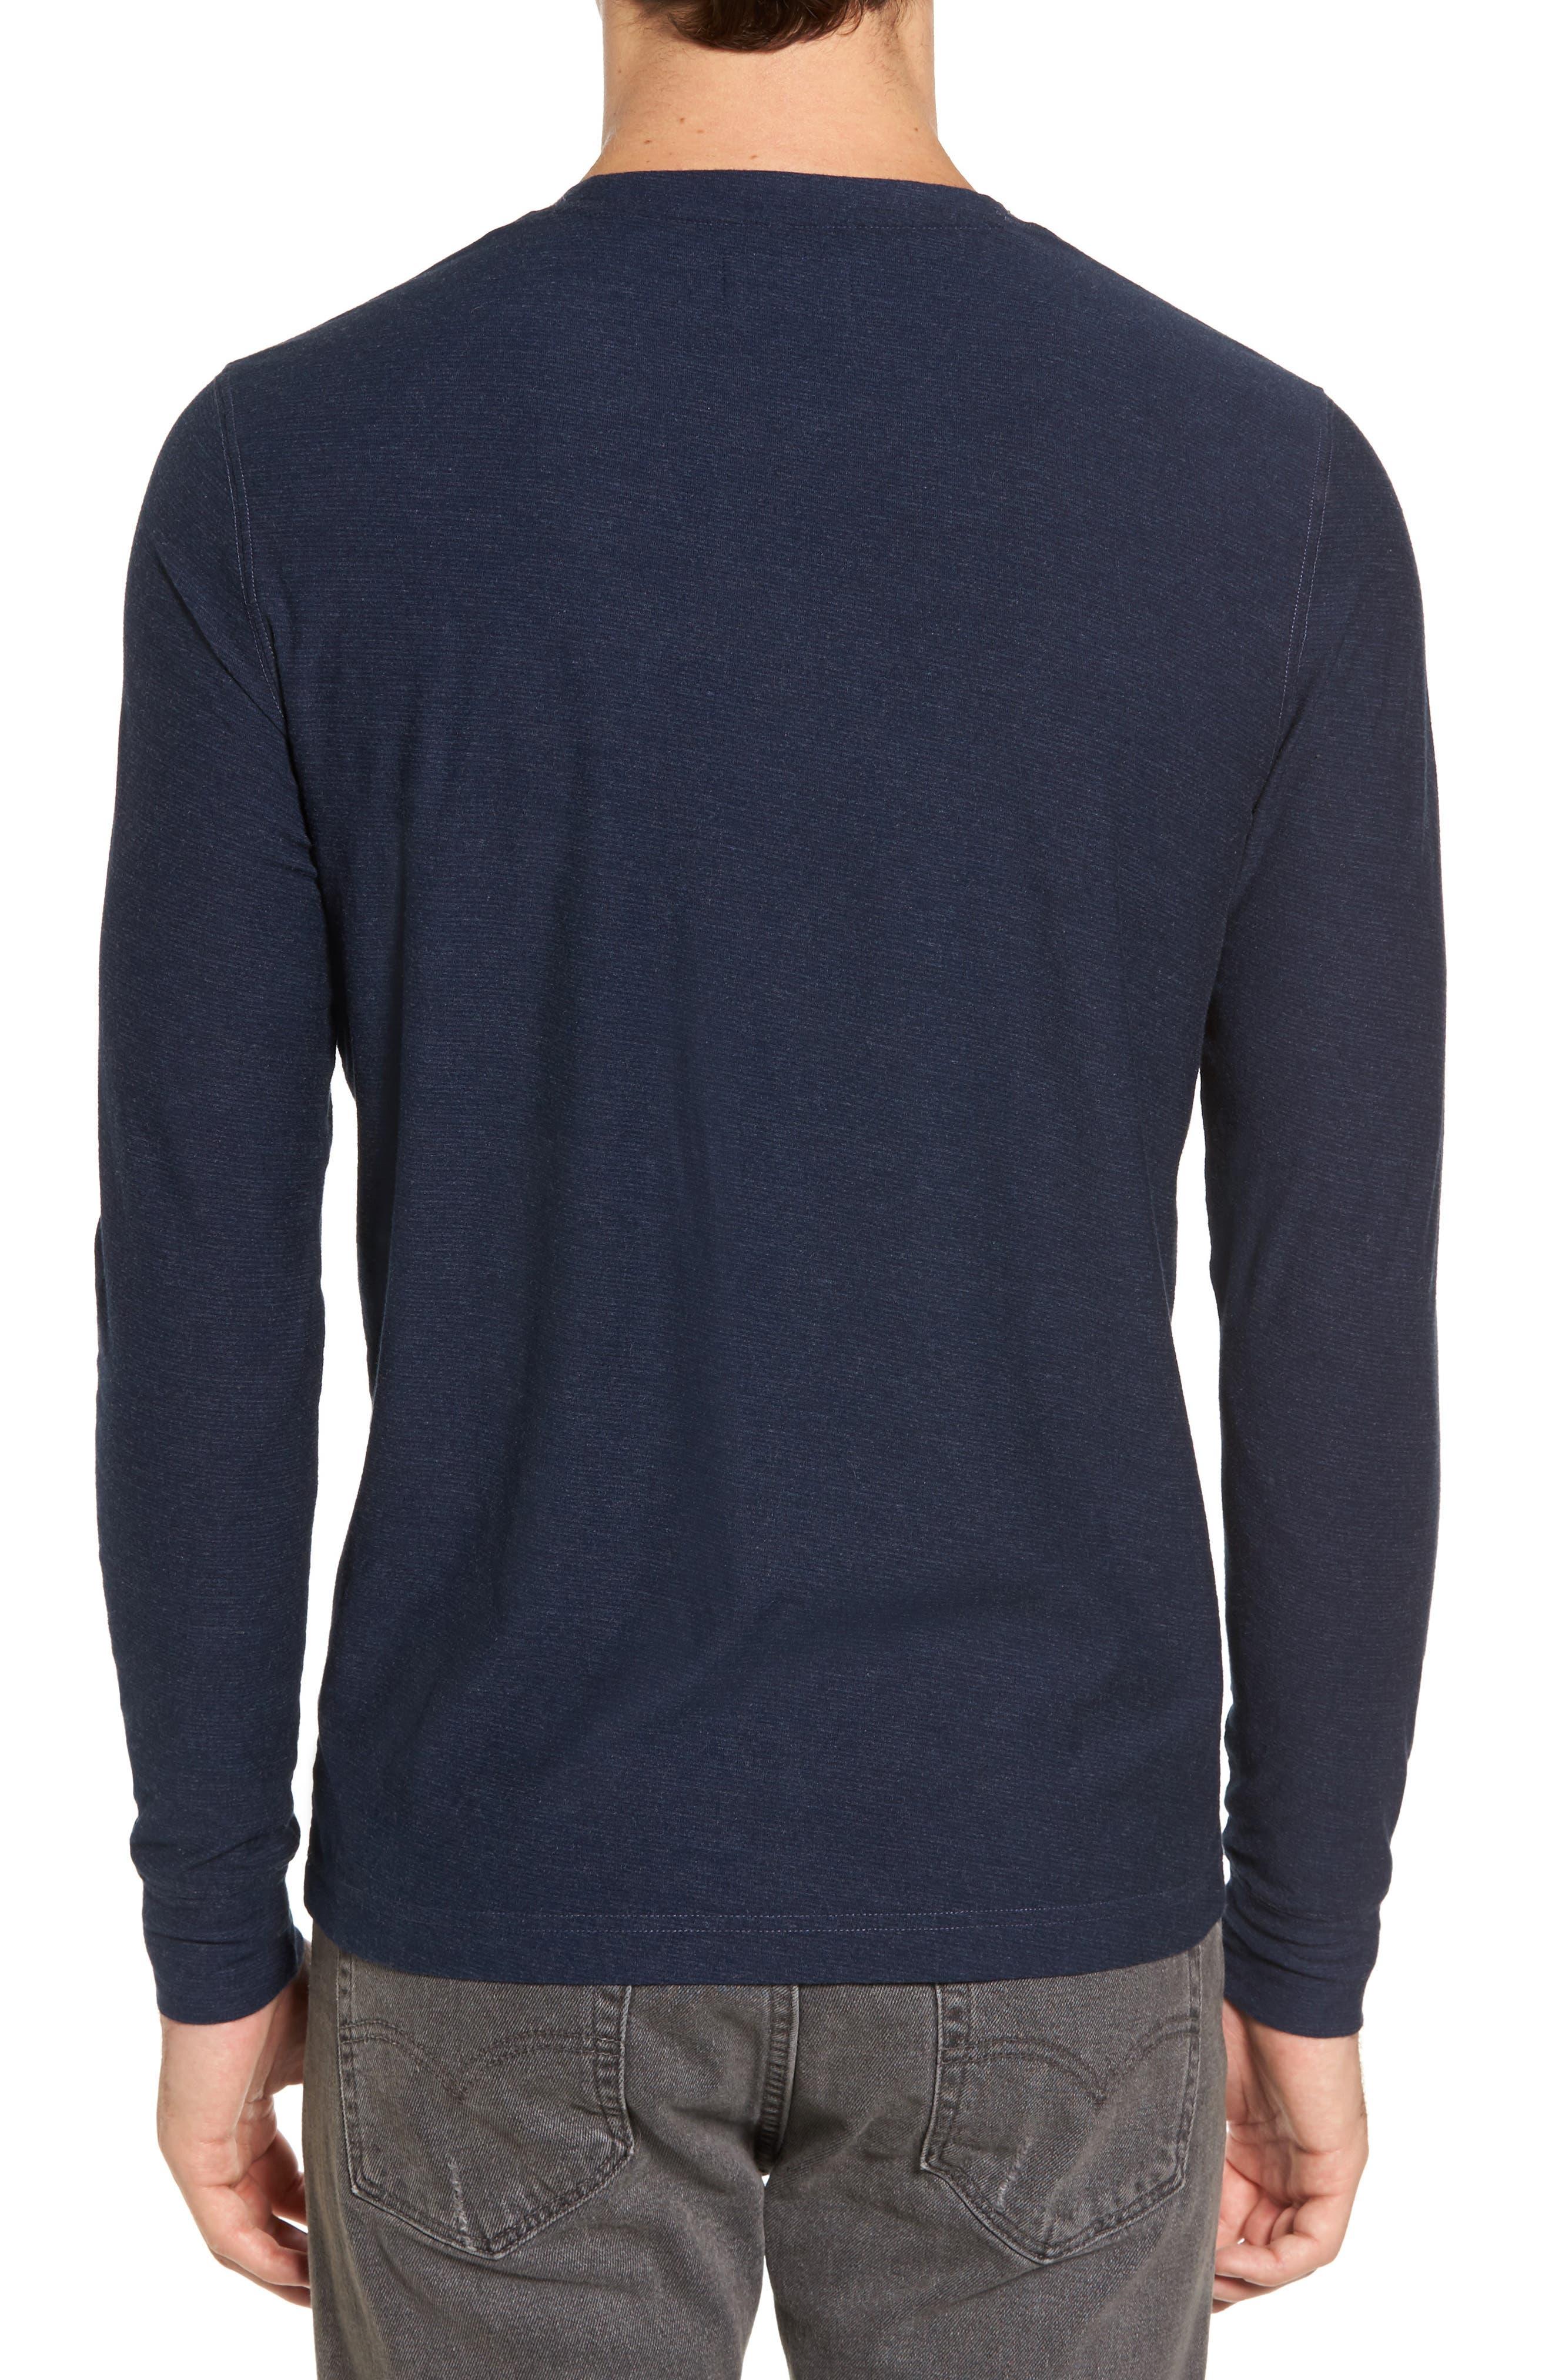 Drake Crewneck Shirt,                             Alternate thumbnail 2, color,                             411